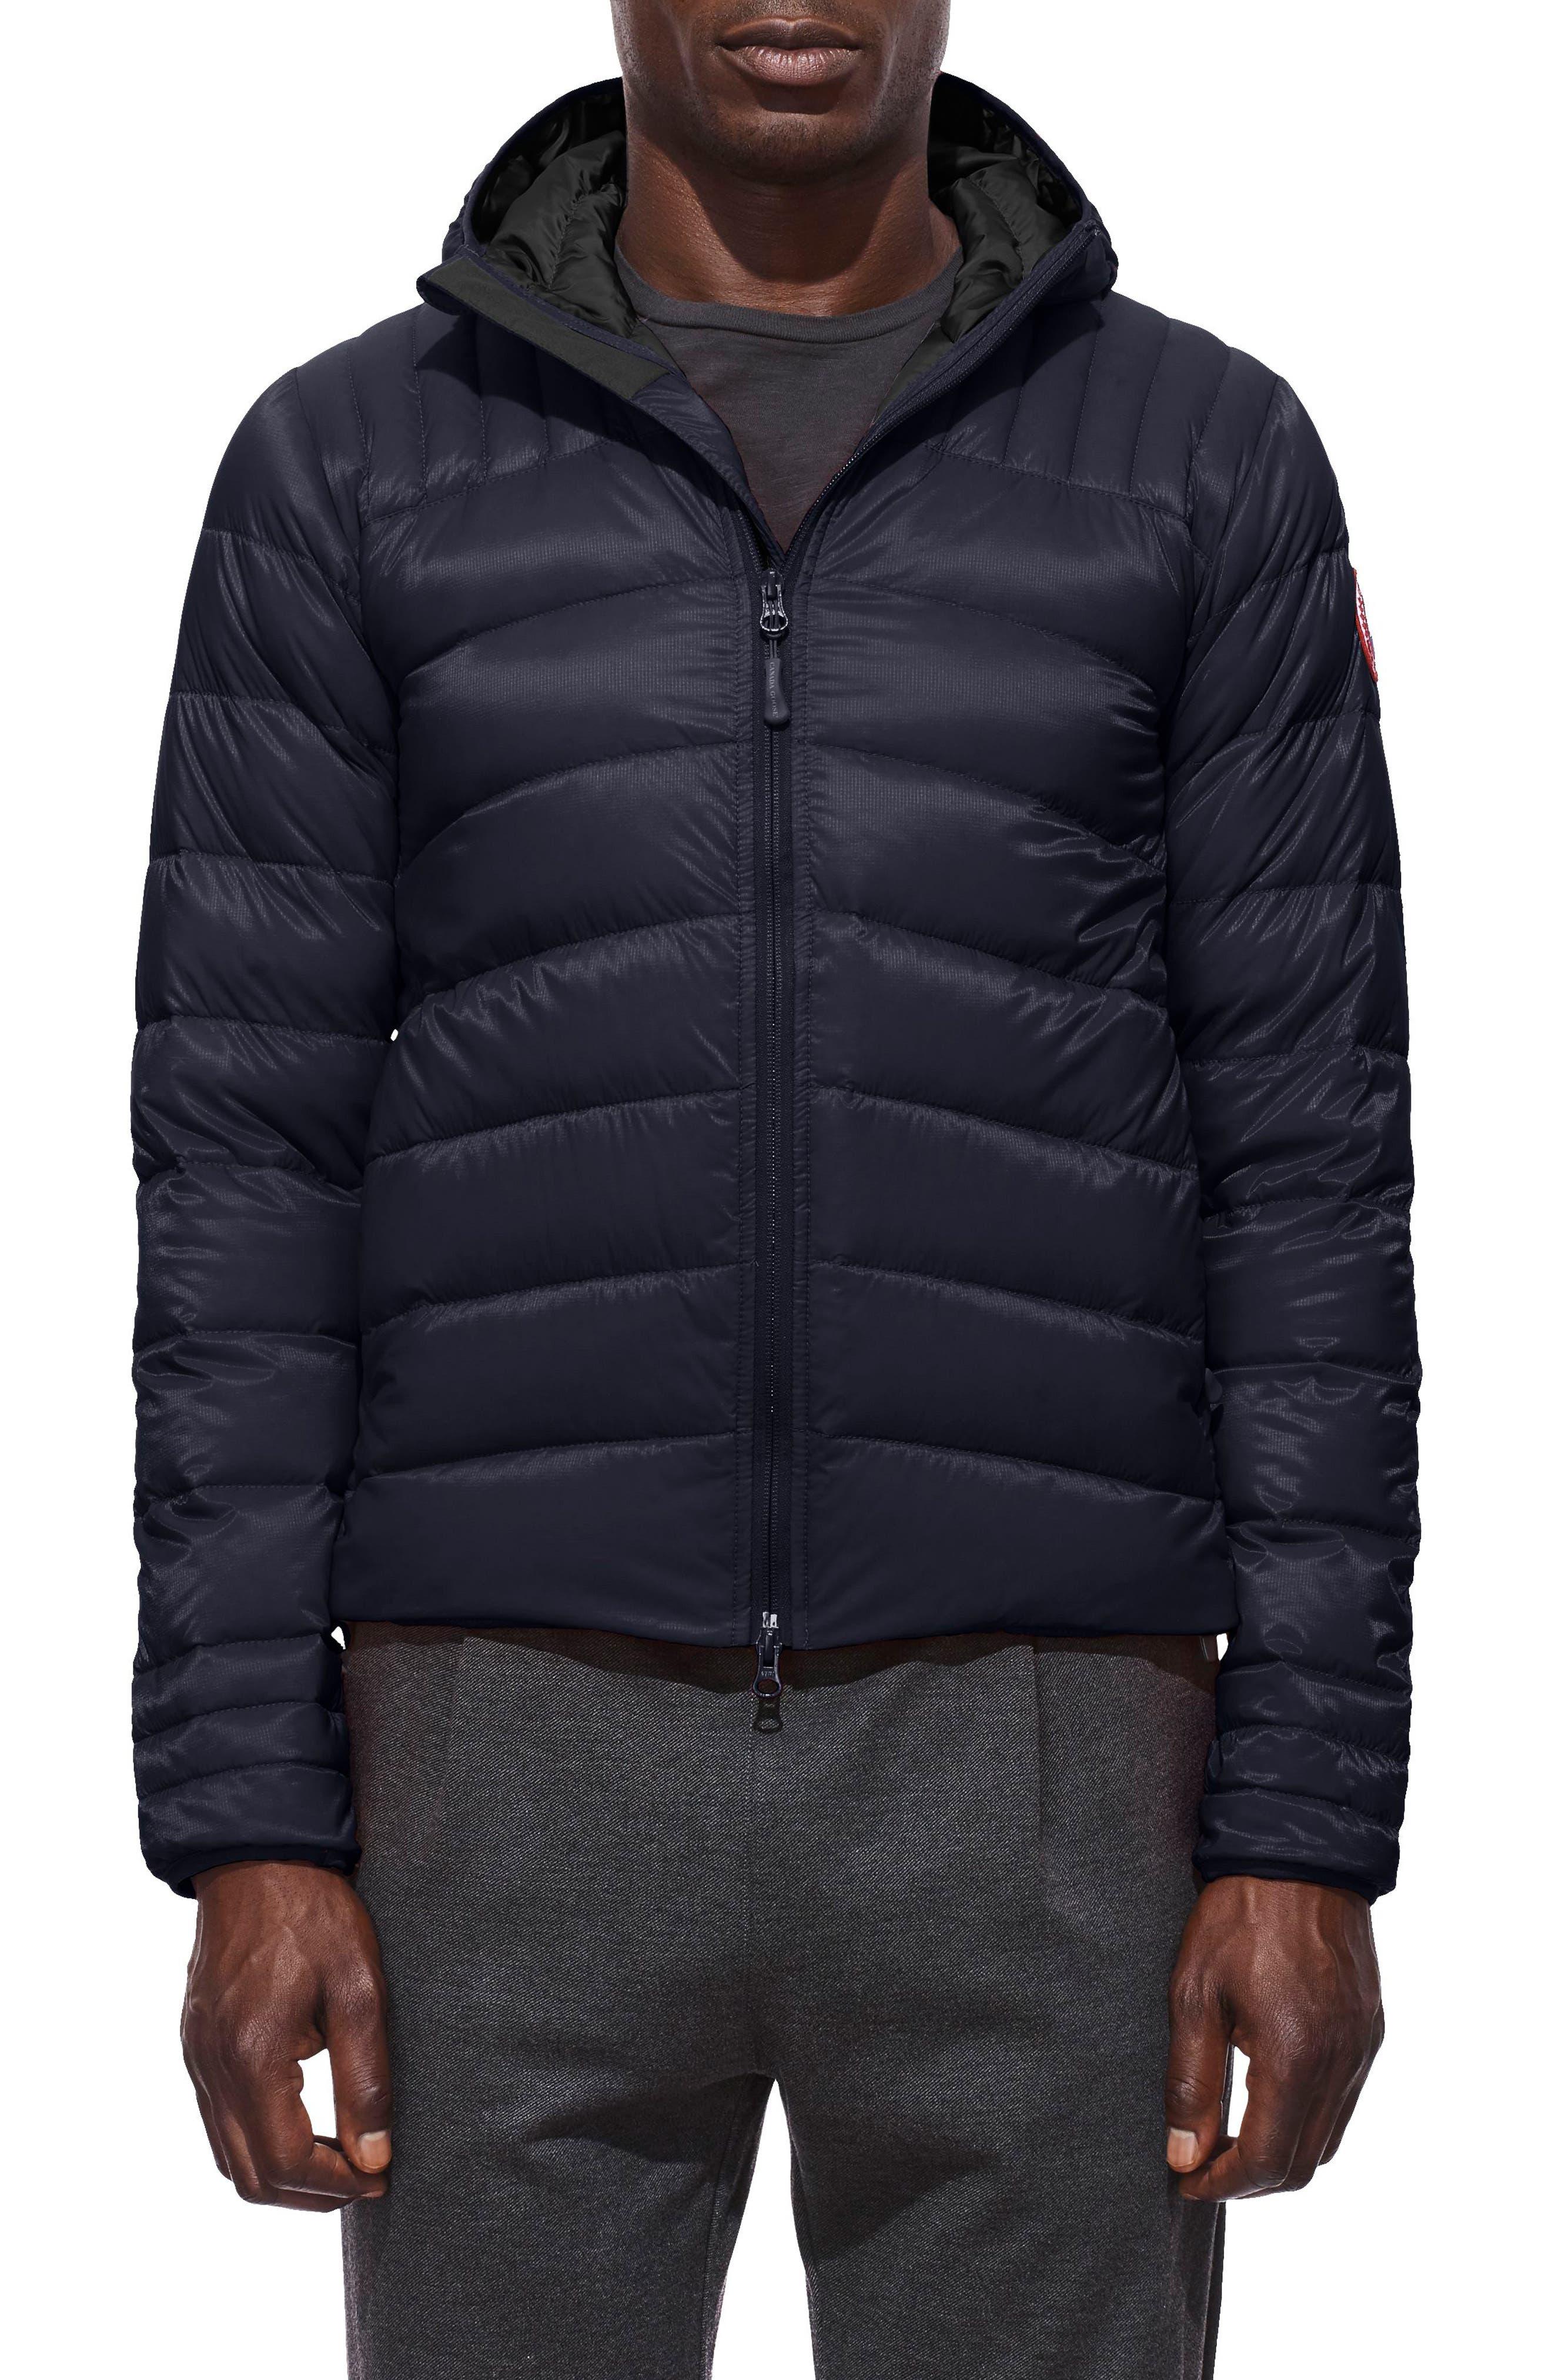 CANADA GOOSE, Brookvale Slim Fit Hooded Down Jacket, Main thumbnail 1, color, ADMIRAL BLUE/ BLACK